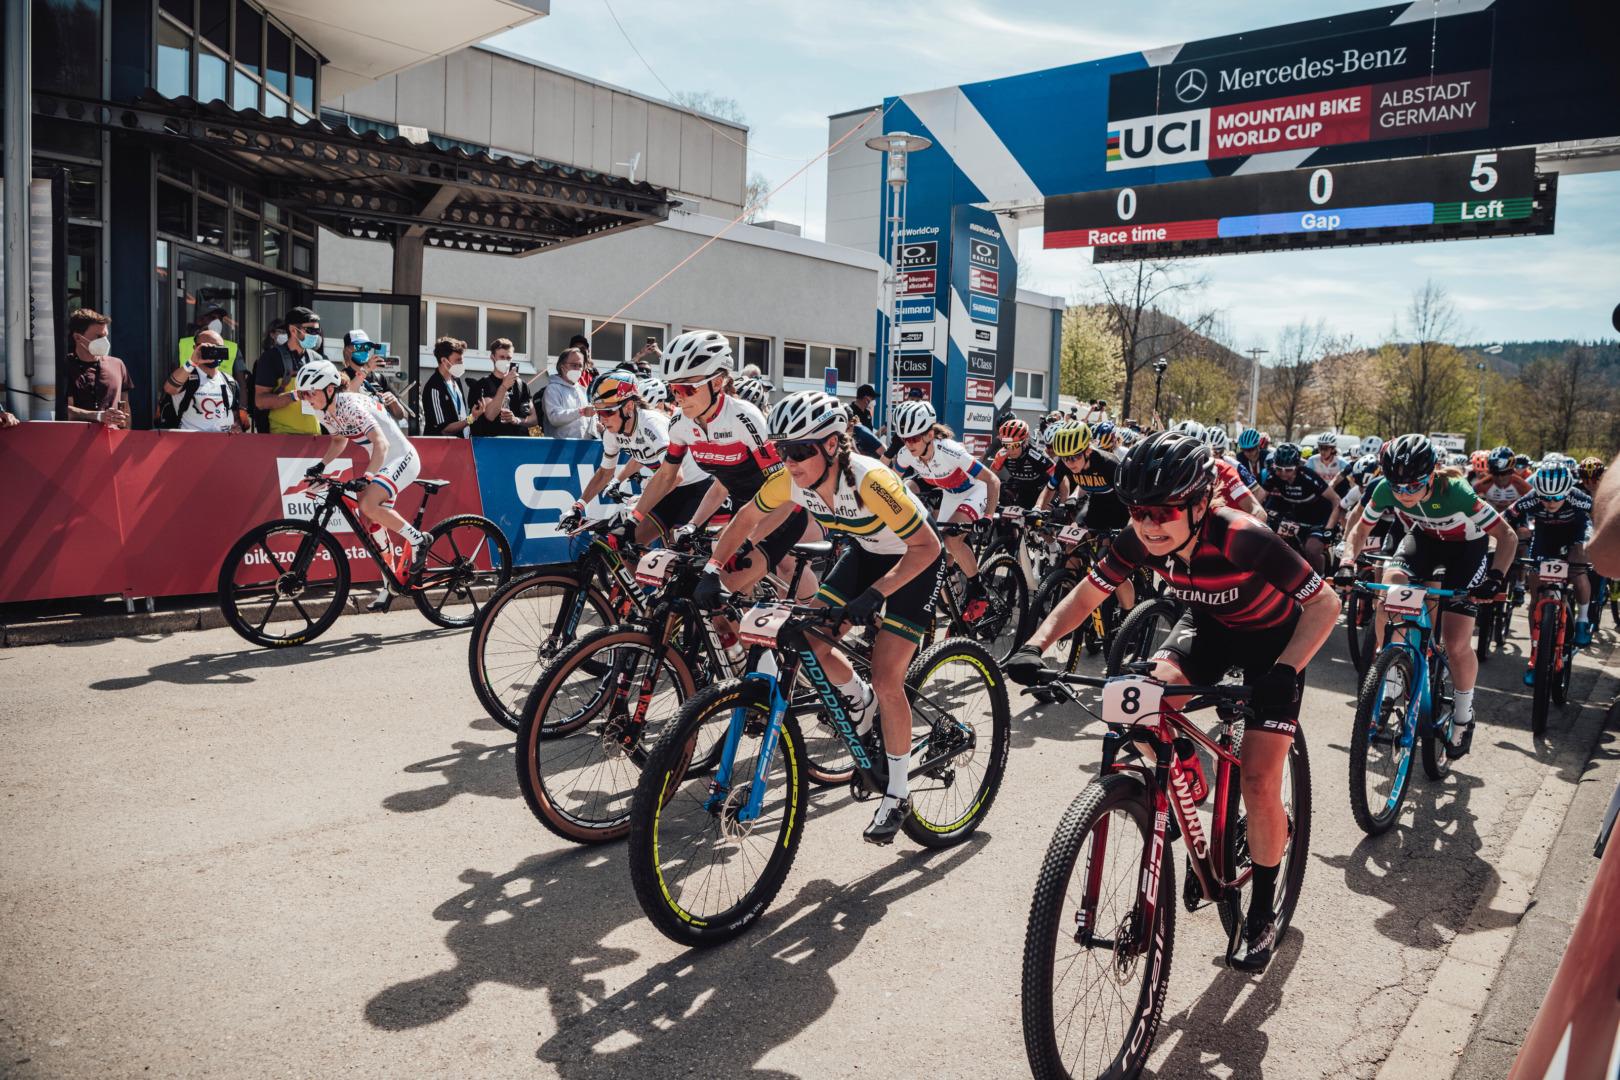 Komentarze postartowe – elita kobiet | Puchar  Świata MTB XCO, Albstadt